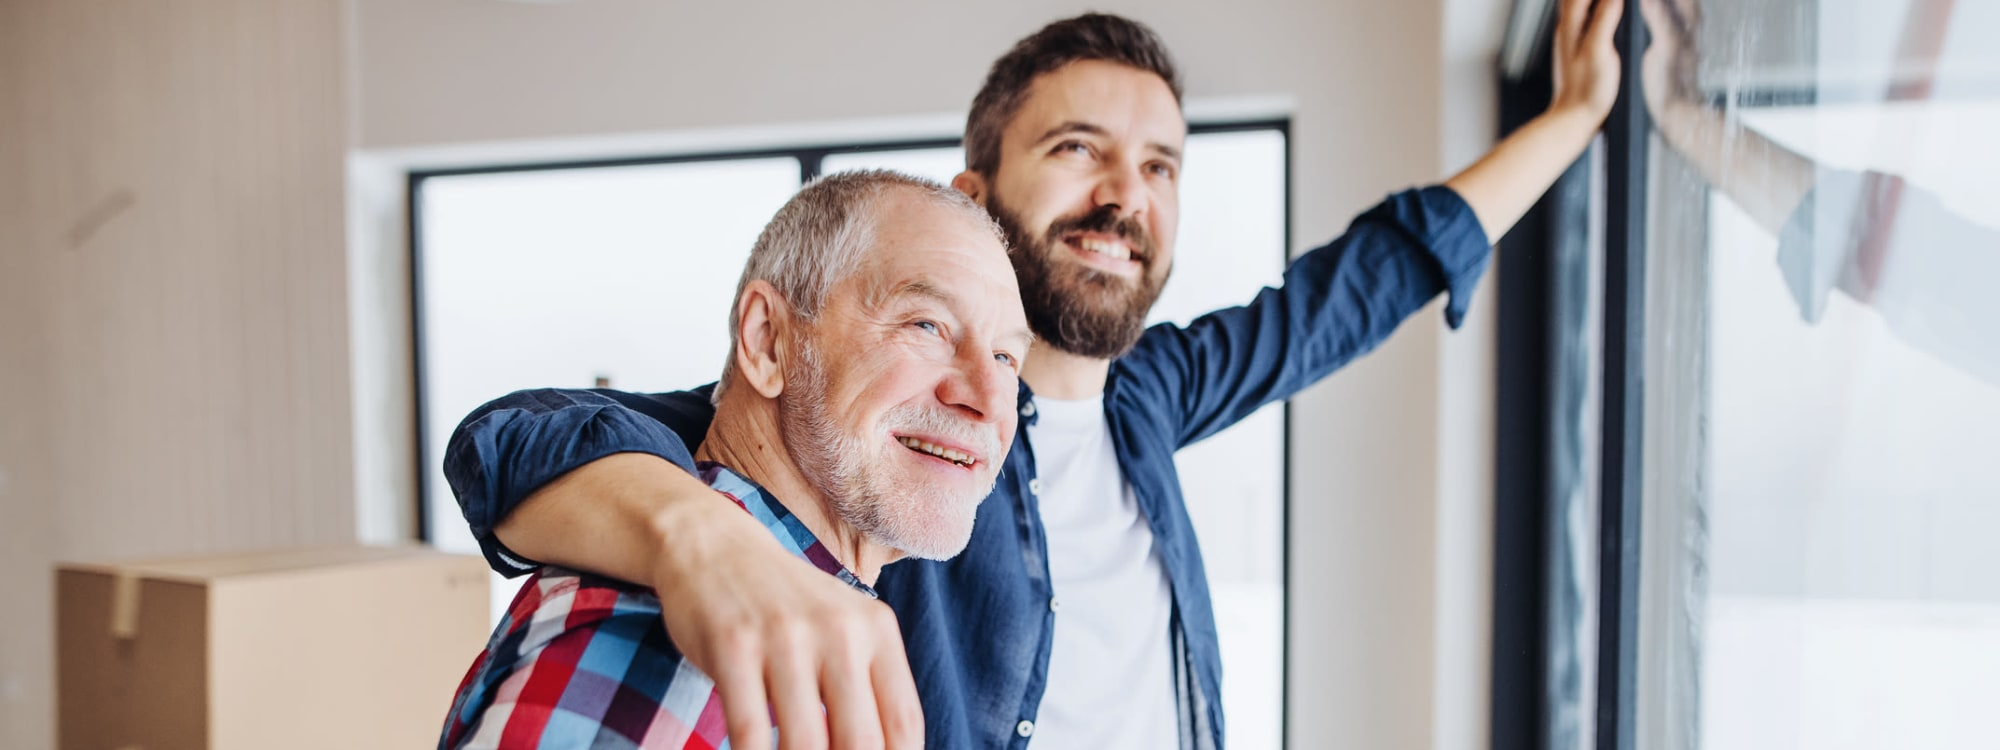 I'm Looking For - A Parent at Ebenezer Senior Living